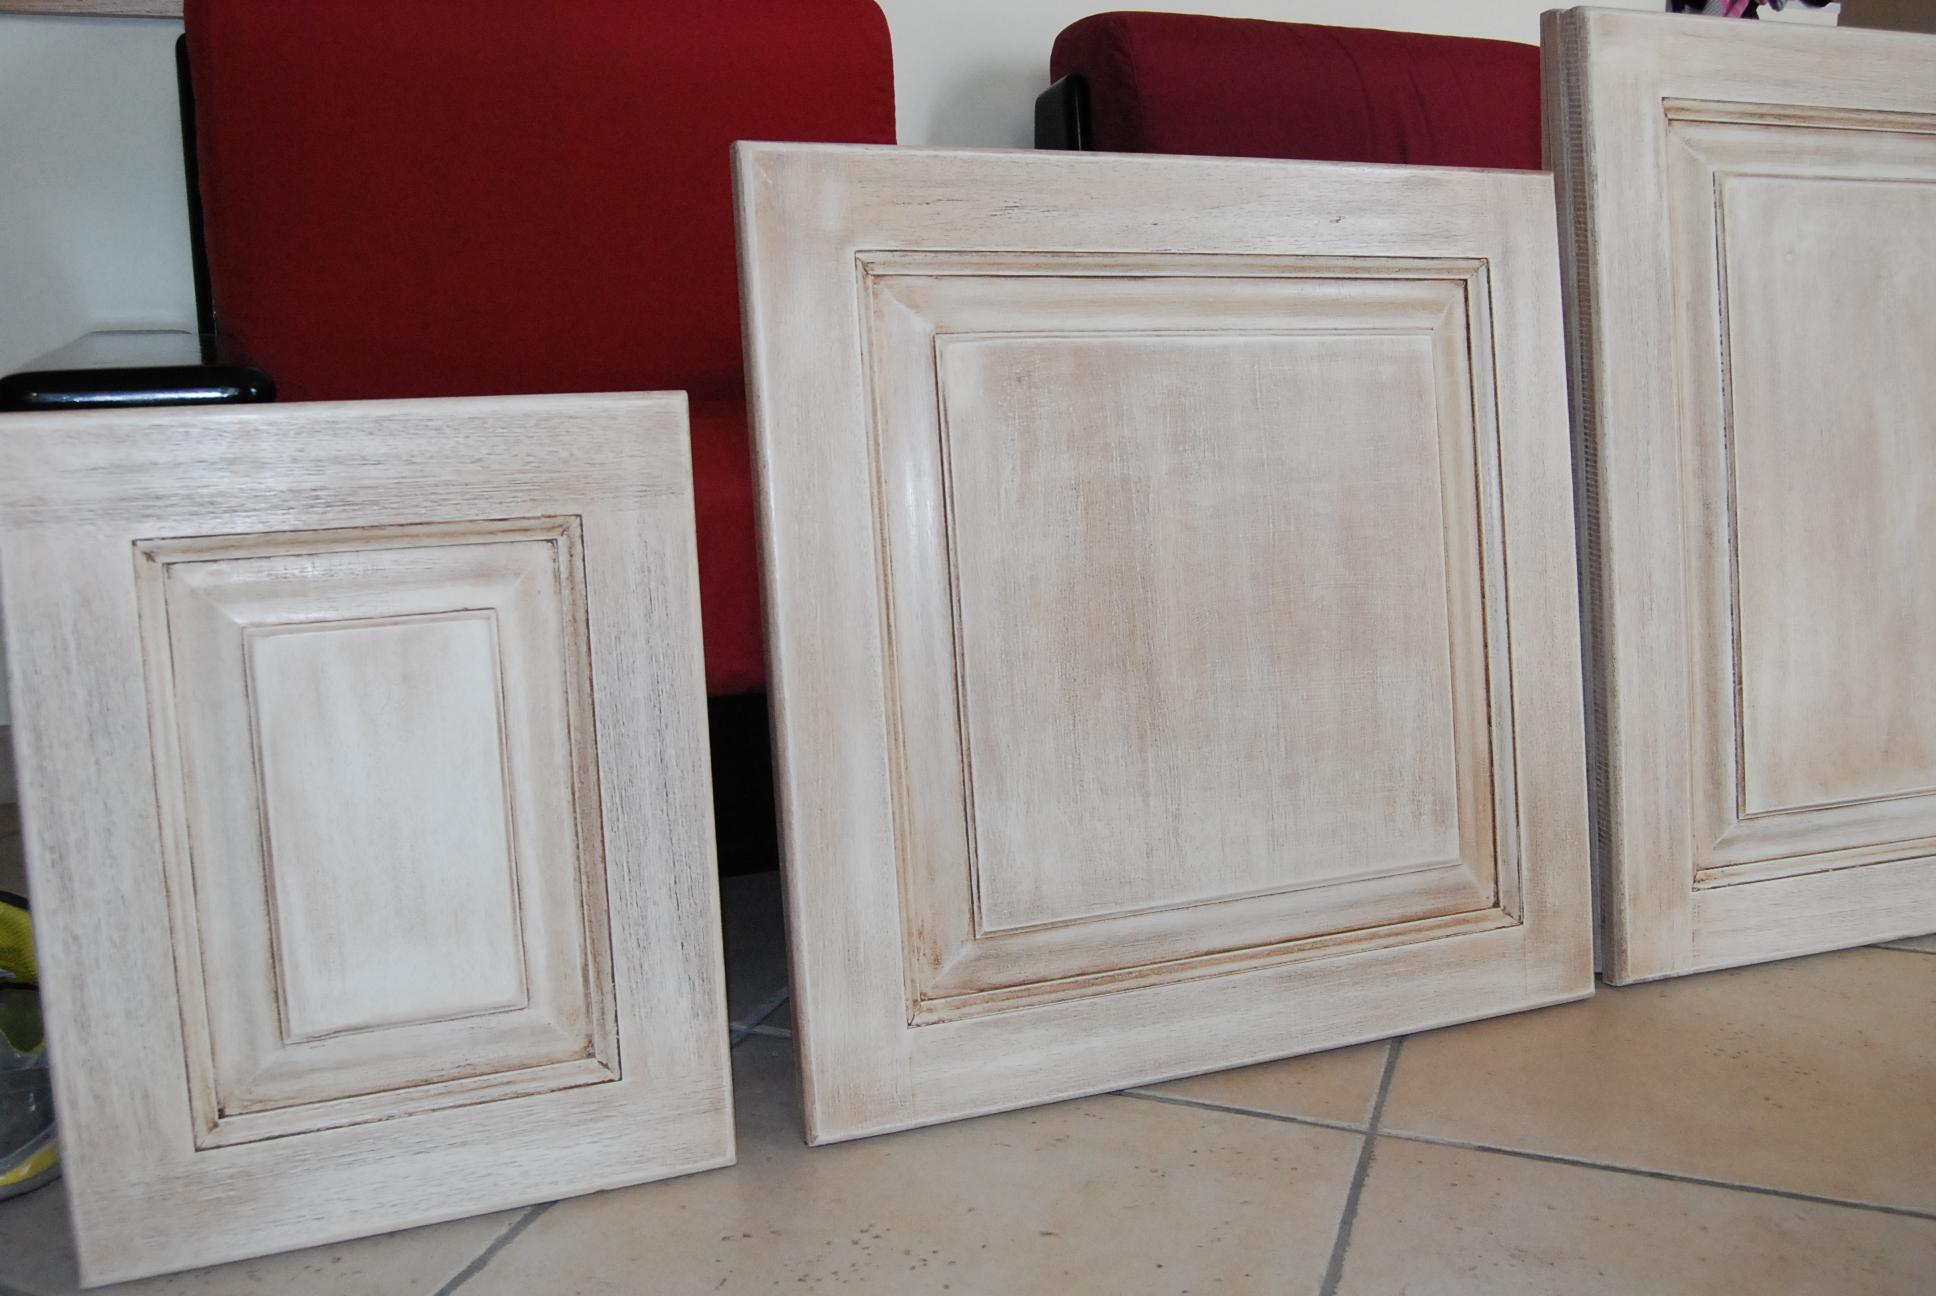 Verniciare ante cucina legno cool cool stunning ante in legno per cucina in muratura photos - Verniciare ante cucina legno ...